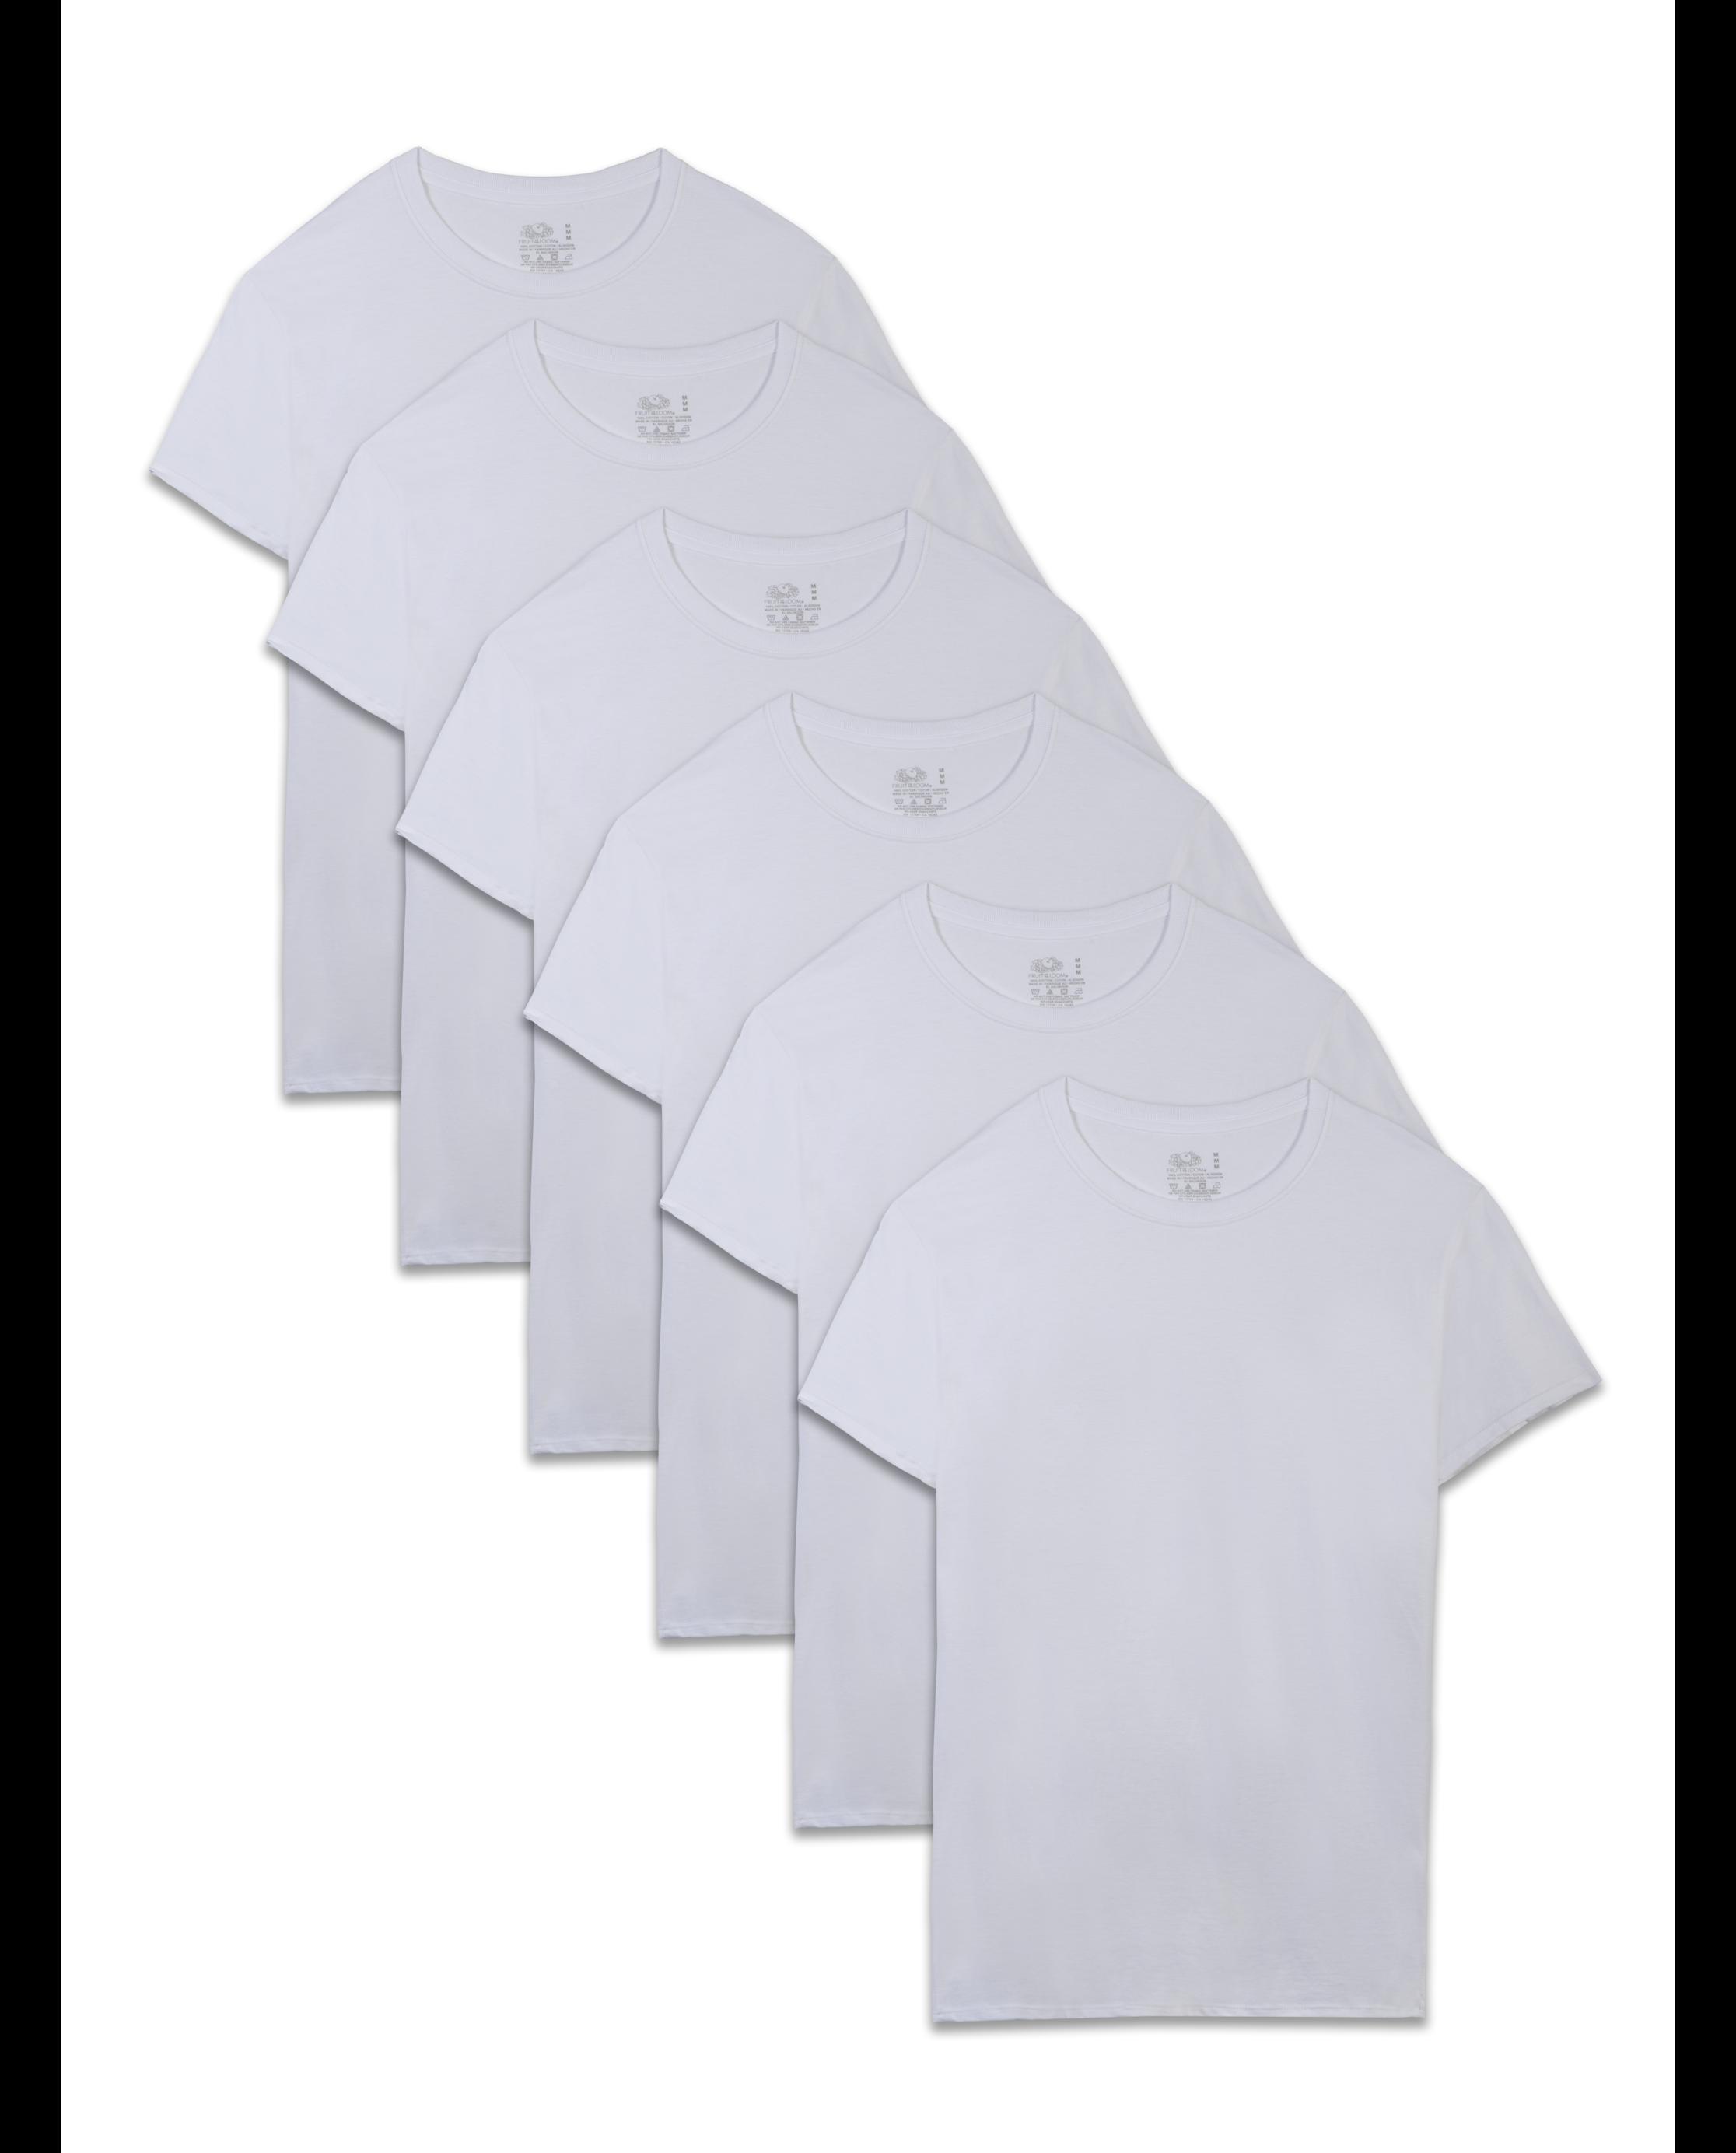 Essentials Mens 6-Pack Crewneck Undershirts